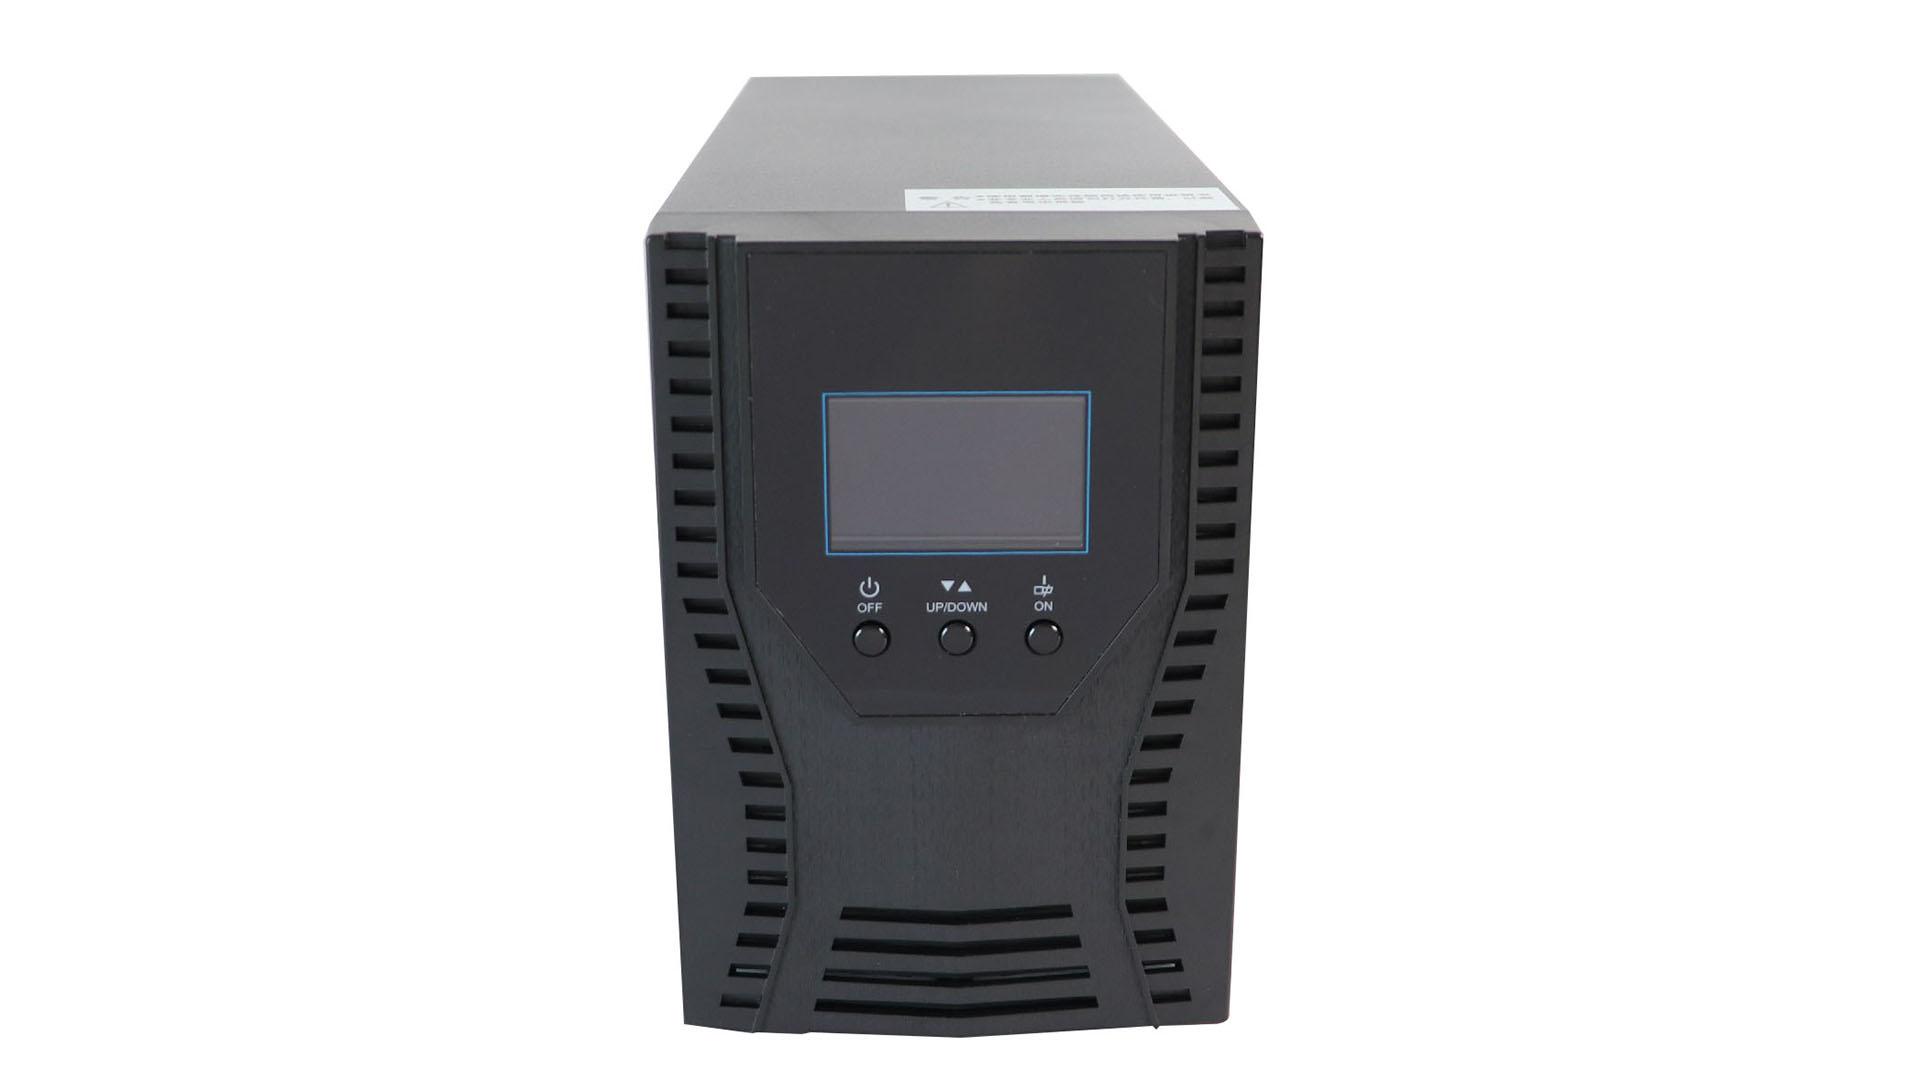 High Quality Best Line Interactive UPS 1-3KVA UPS Wholesale-Banatton Technologies (Beijing) Co., Ltd.